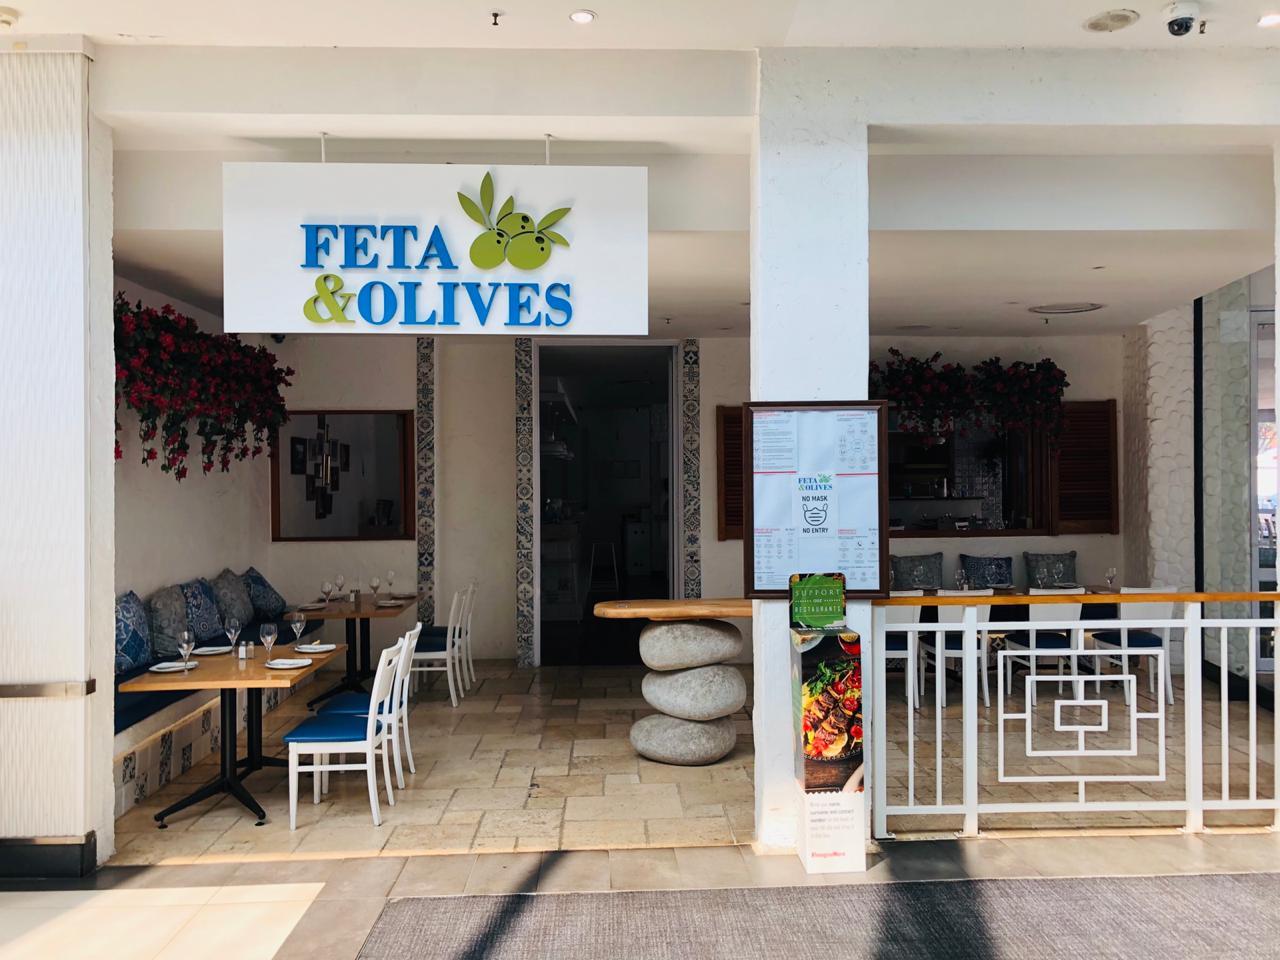 Feta & Olives Restaurant (Previously PLAKA)